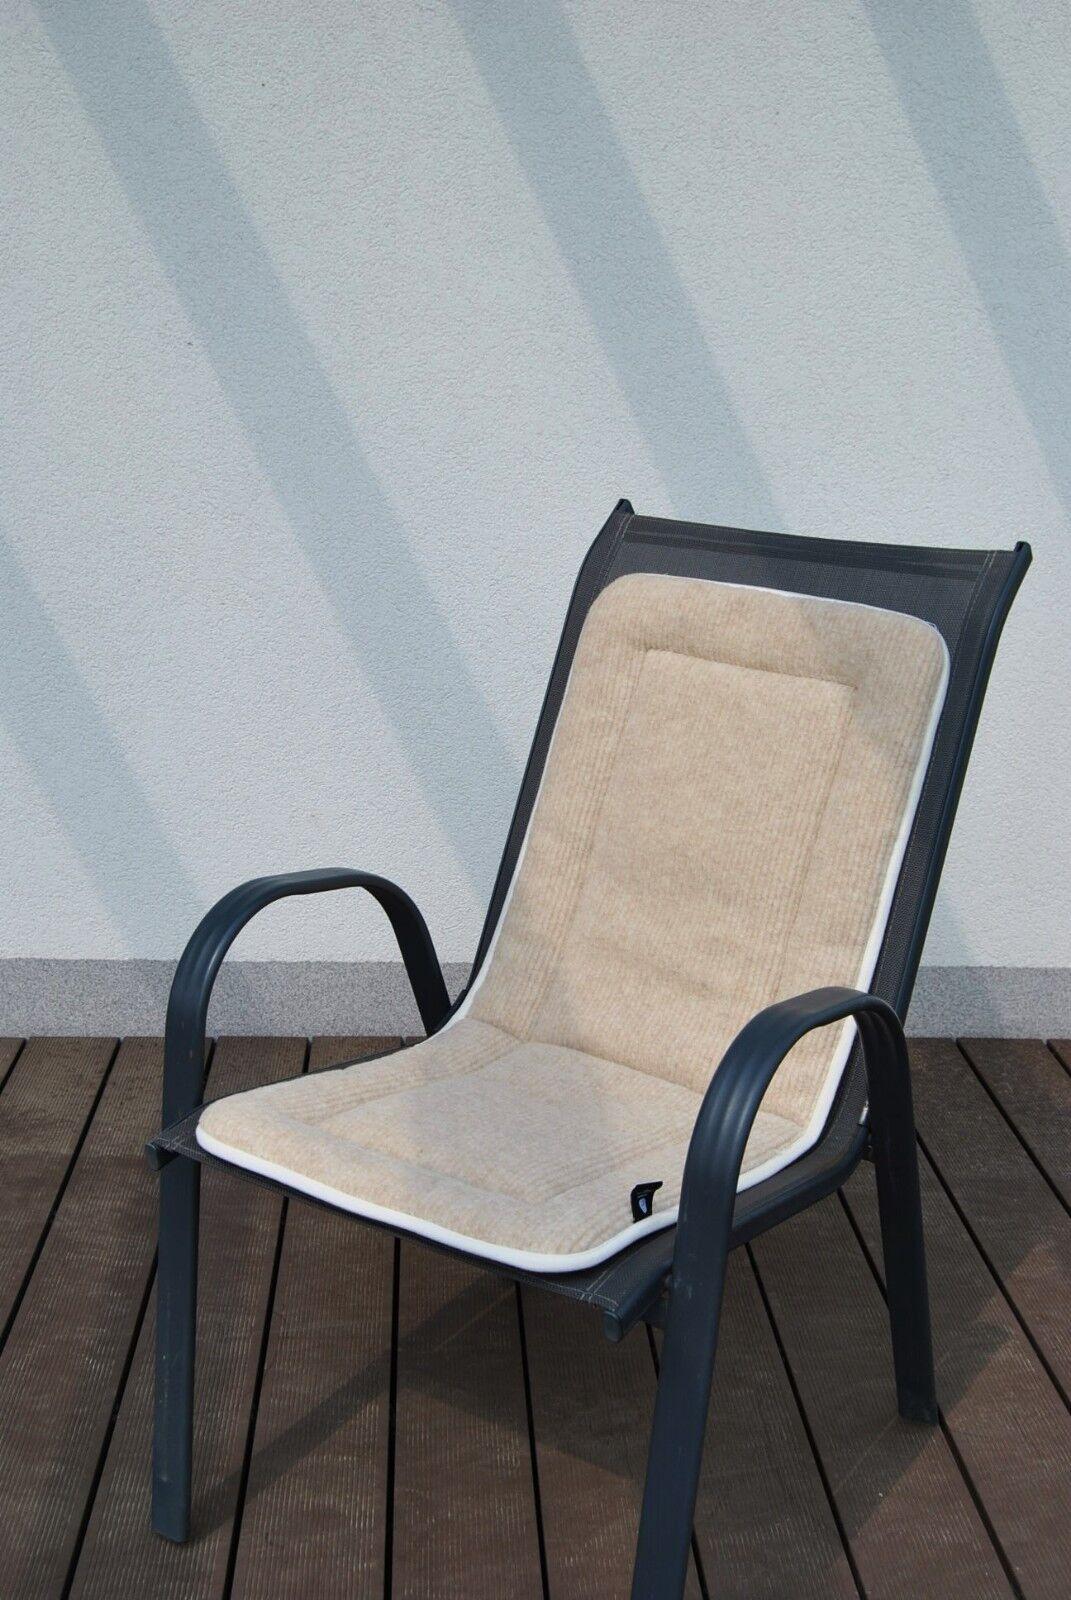 Warming Seat Covers Merino Wool Merino Wool Wool Car Chair Seat Covers Pads